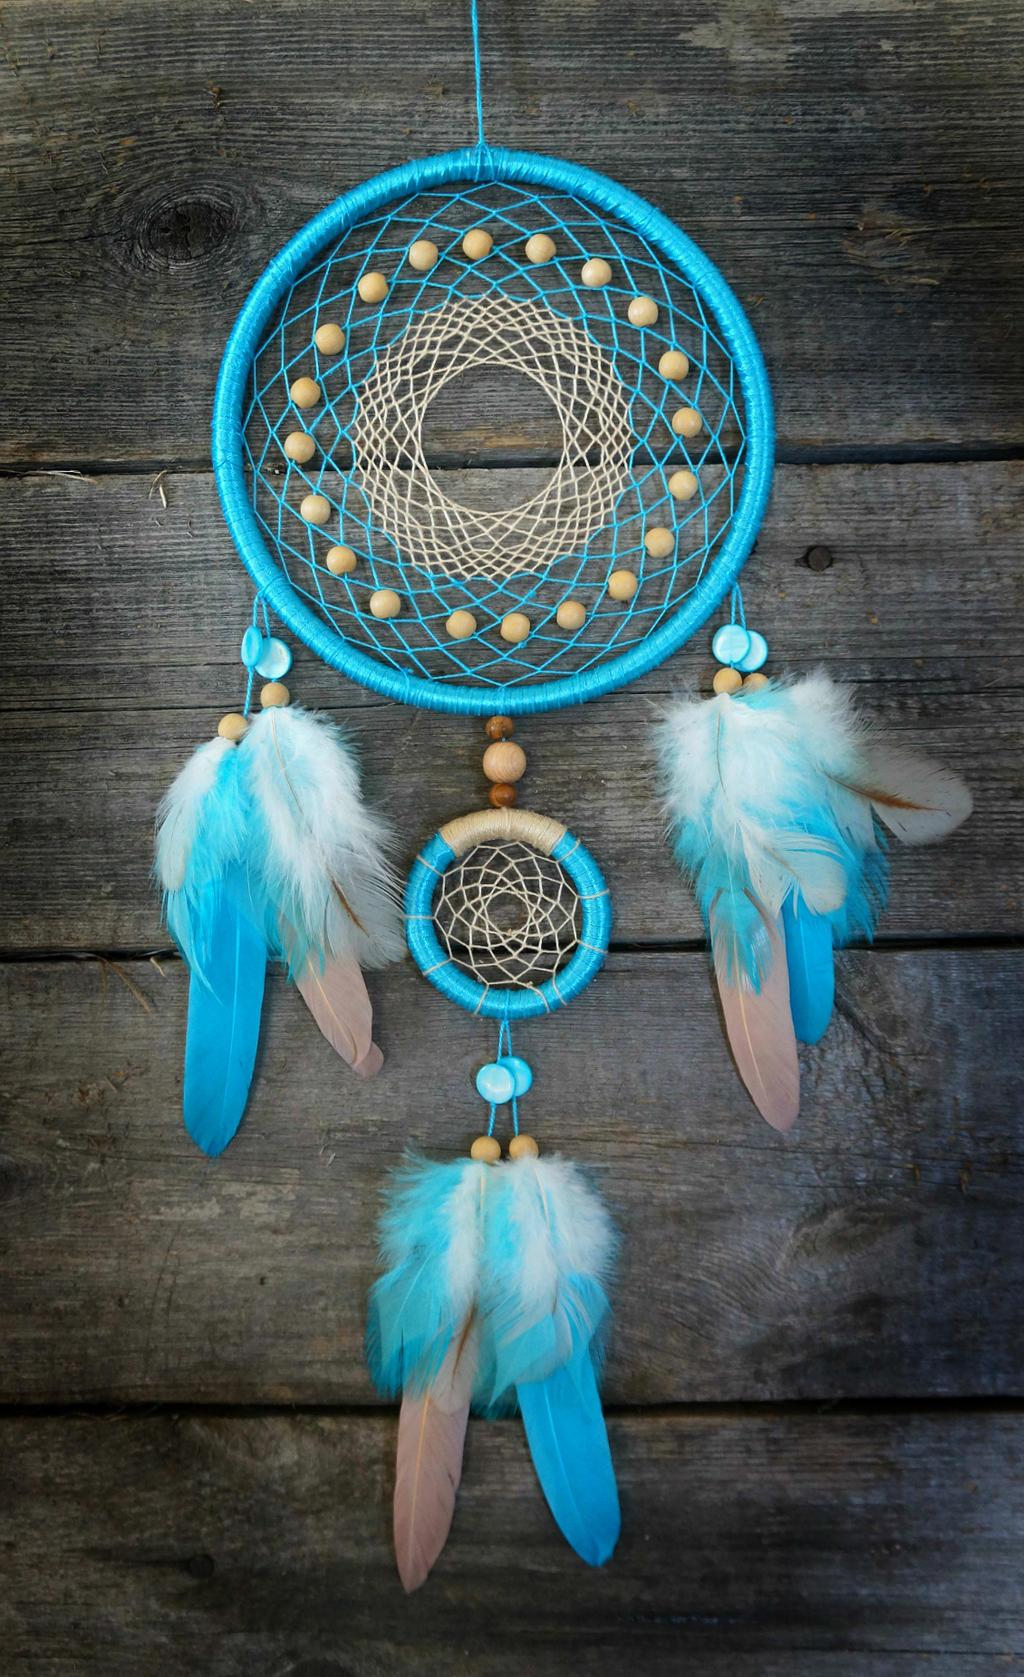 Blue dreamcatcher by sorochka on deviantart for Dreamcatcher beads meaning